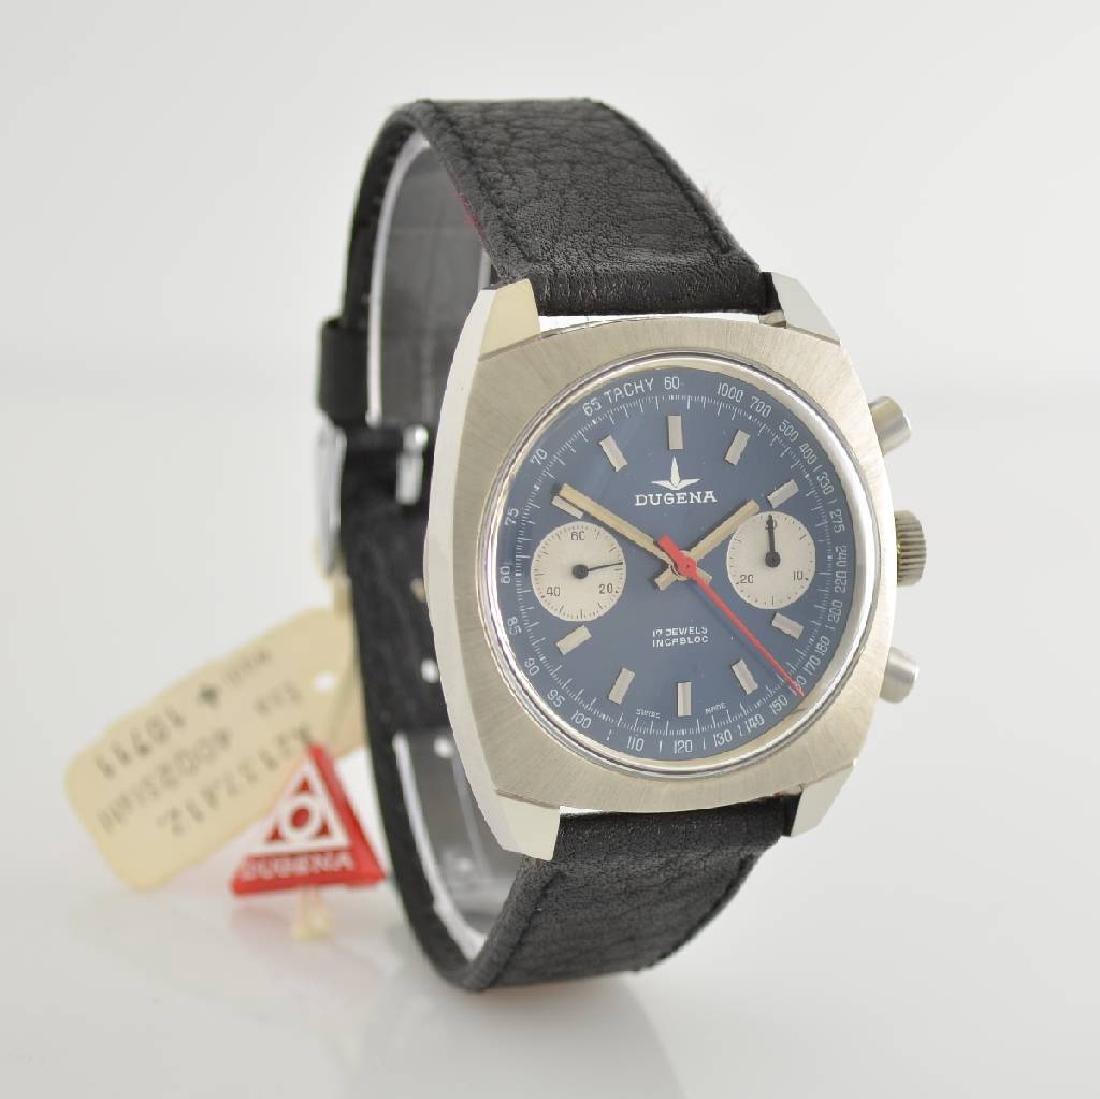 DUGENA unworn gents wristwatch with chronograph - 5